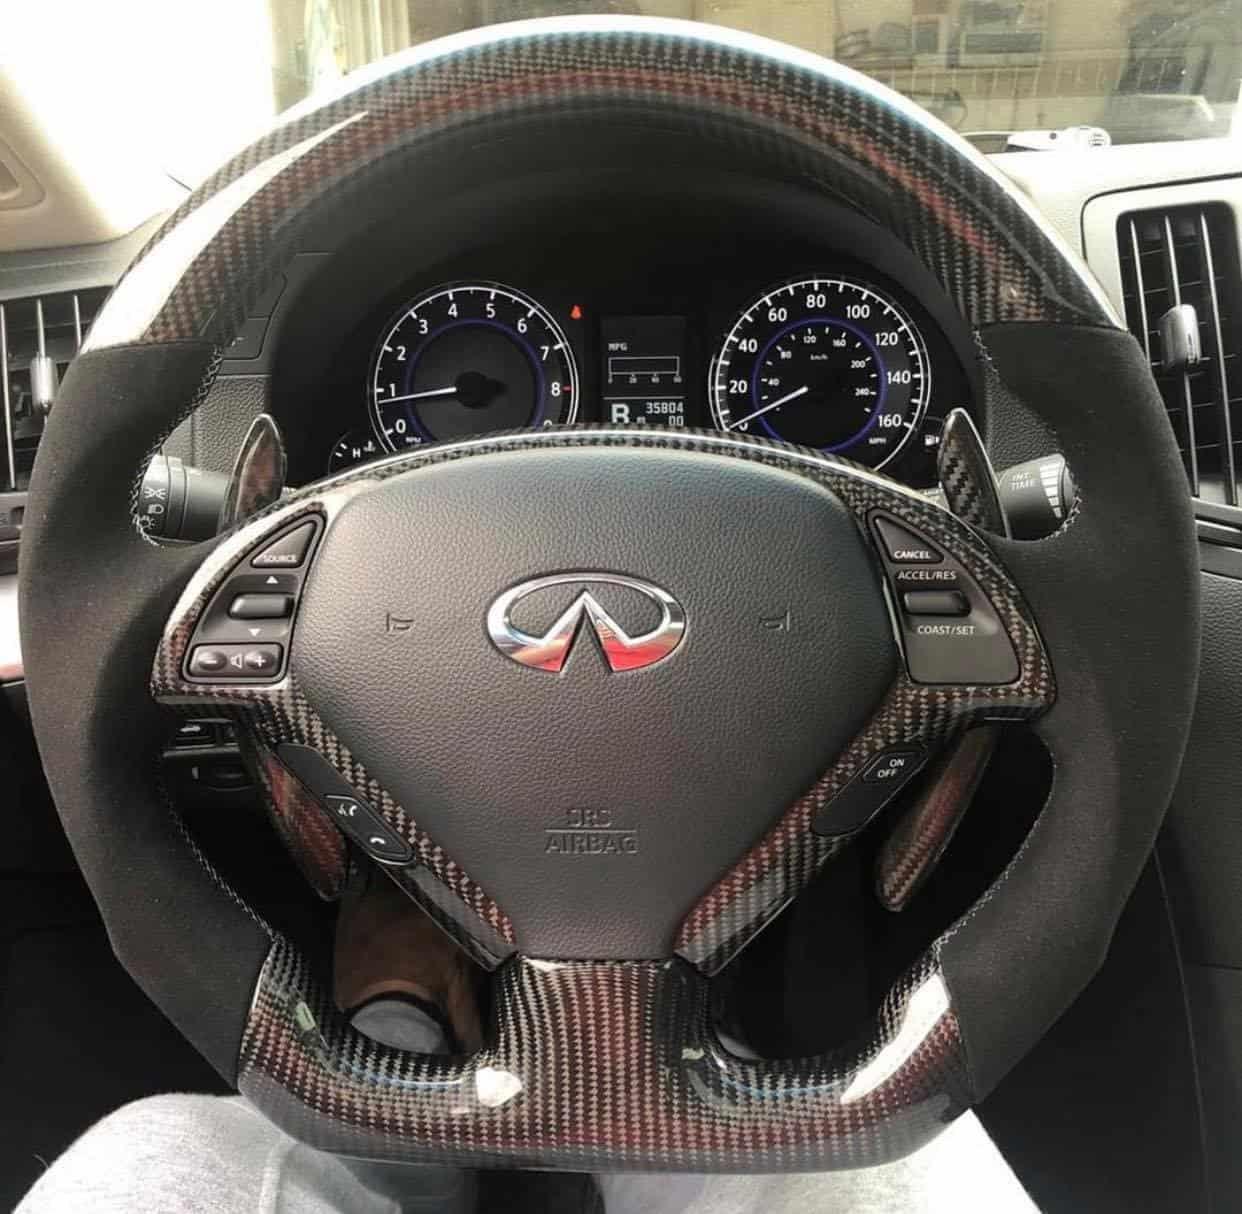 2007 2015 Infiniti G37 G37x G25 Q40 Carbon Fiber Steering Wheel Socal Garage Works